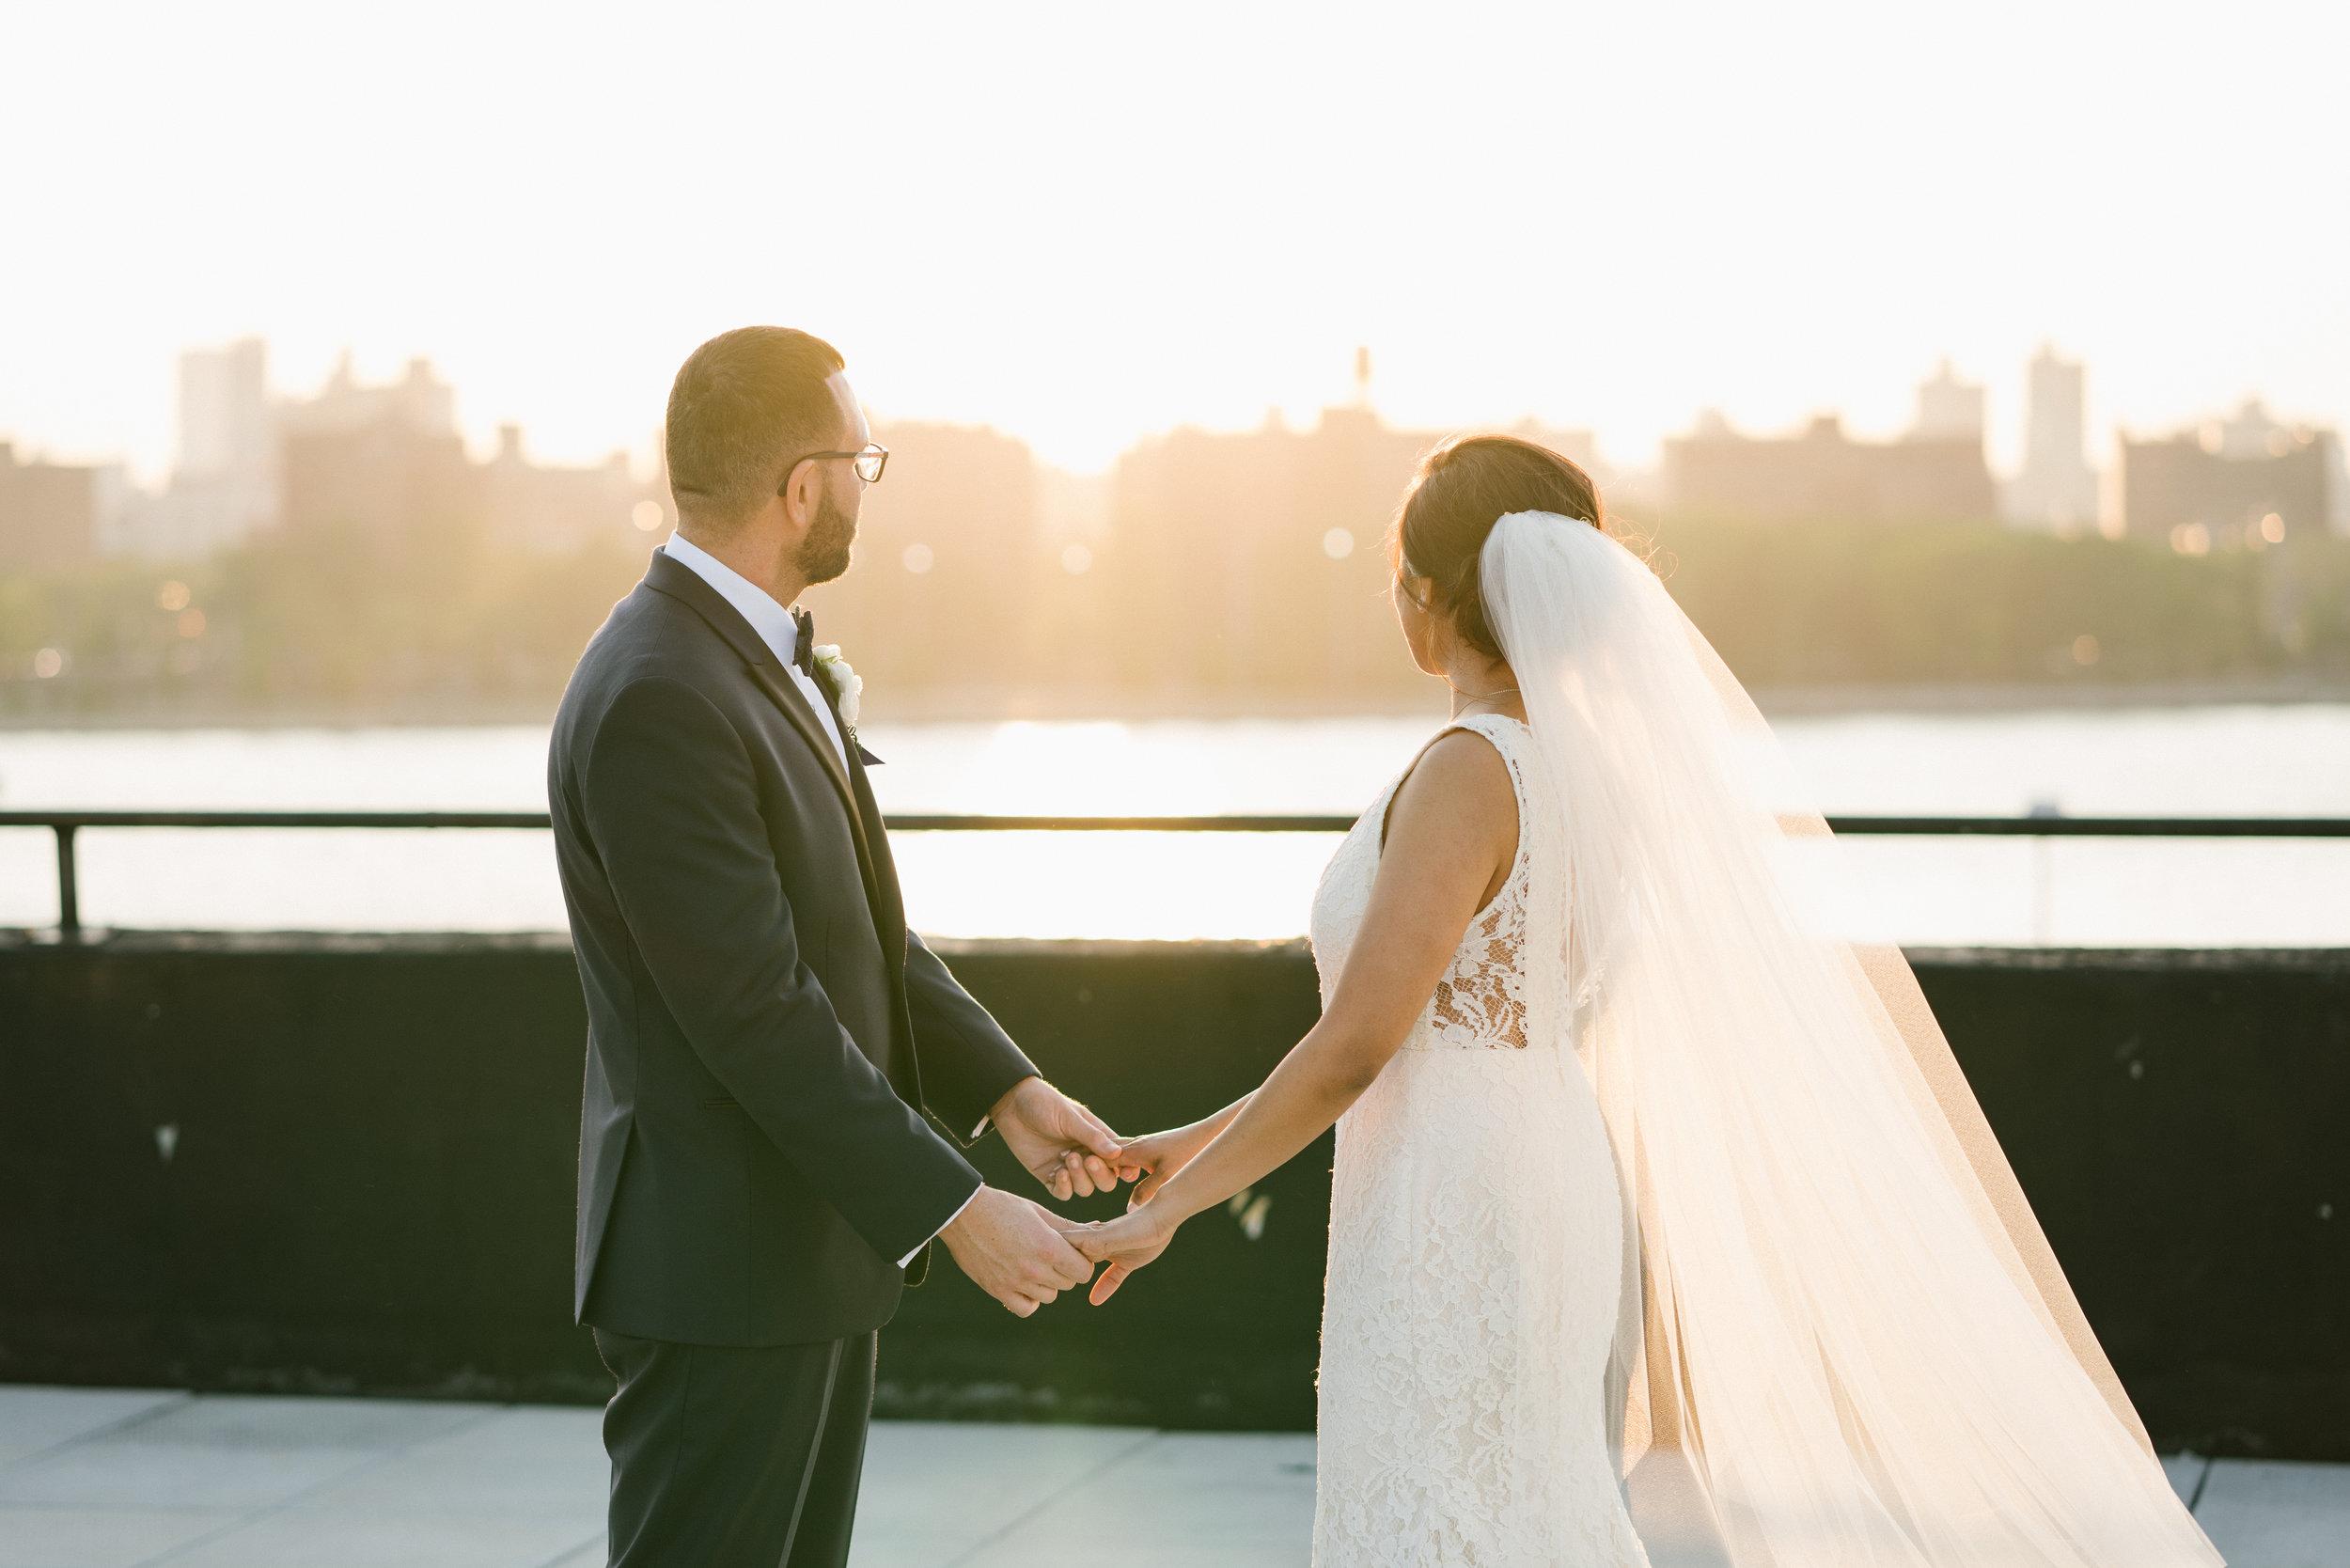 wedding photos by Los Angeles wedding photographer in Orange County